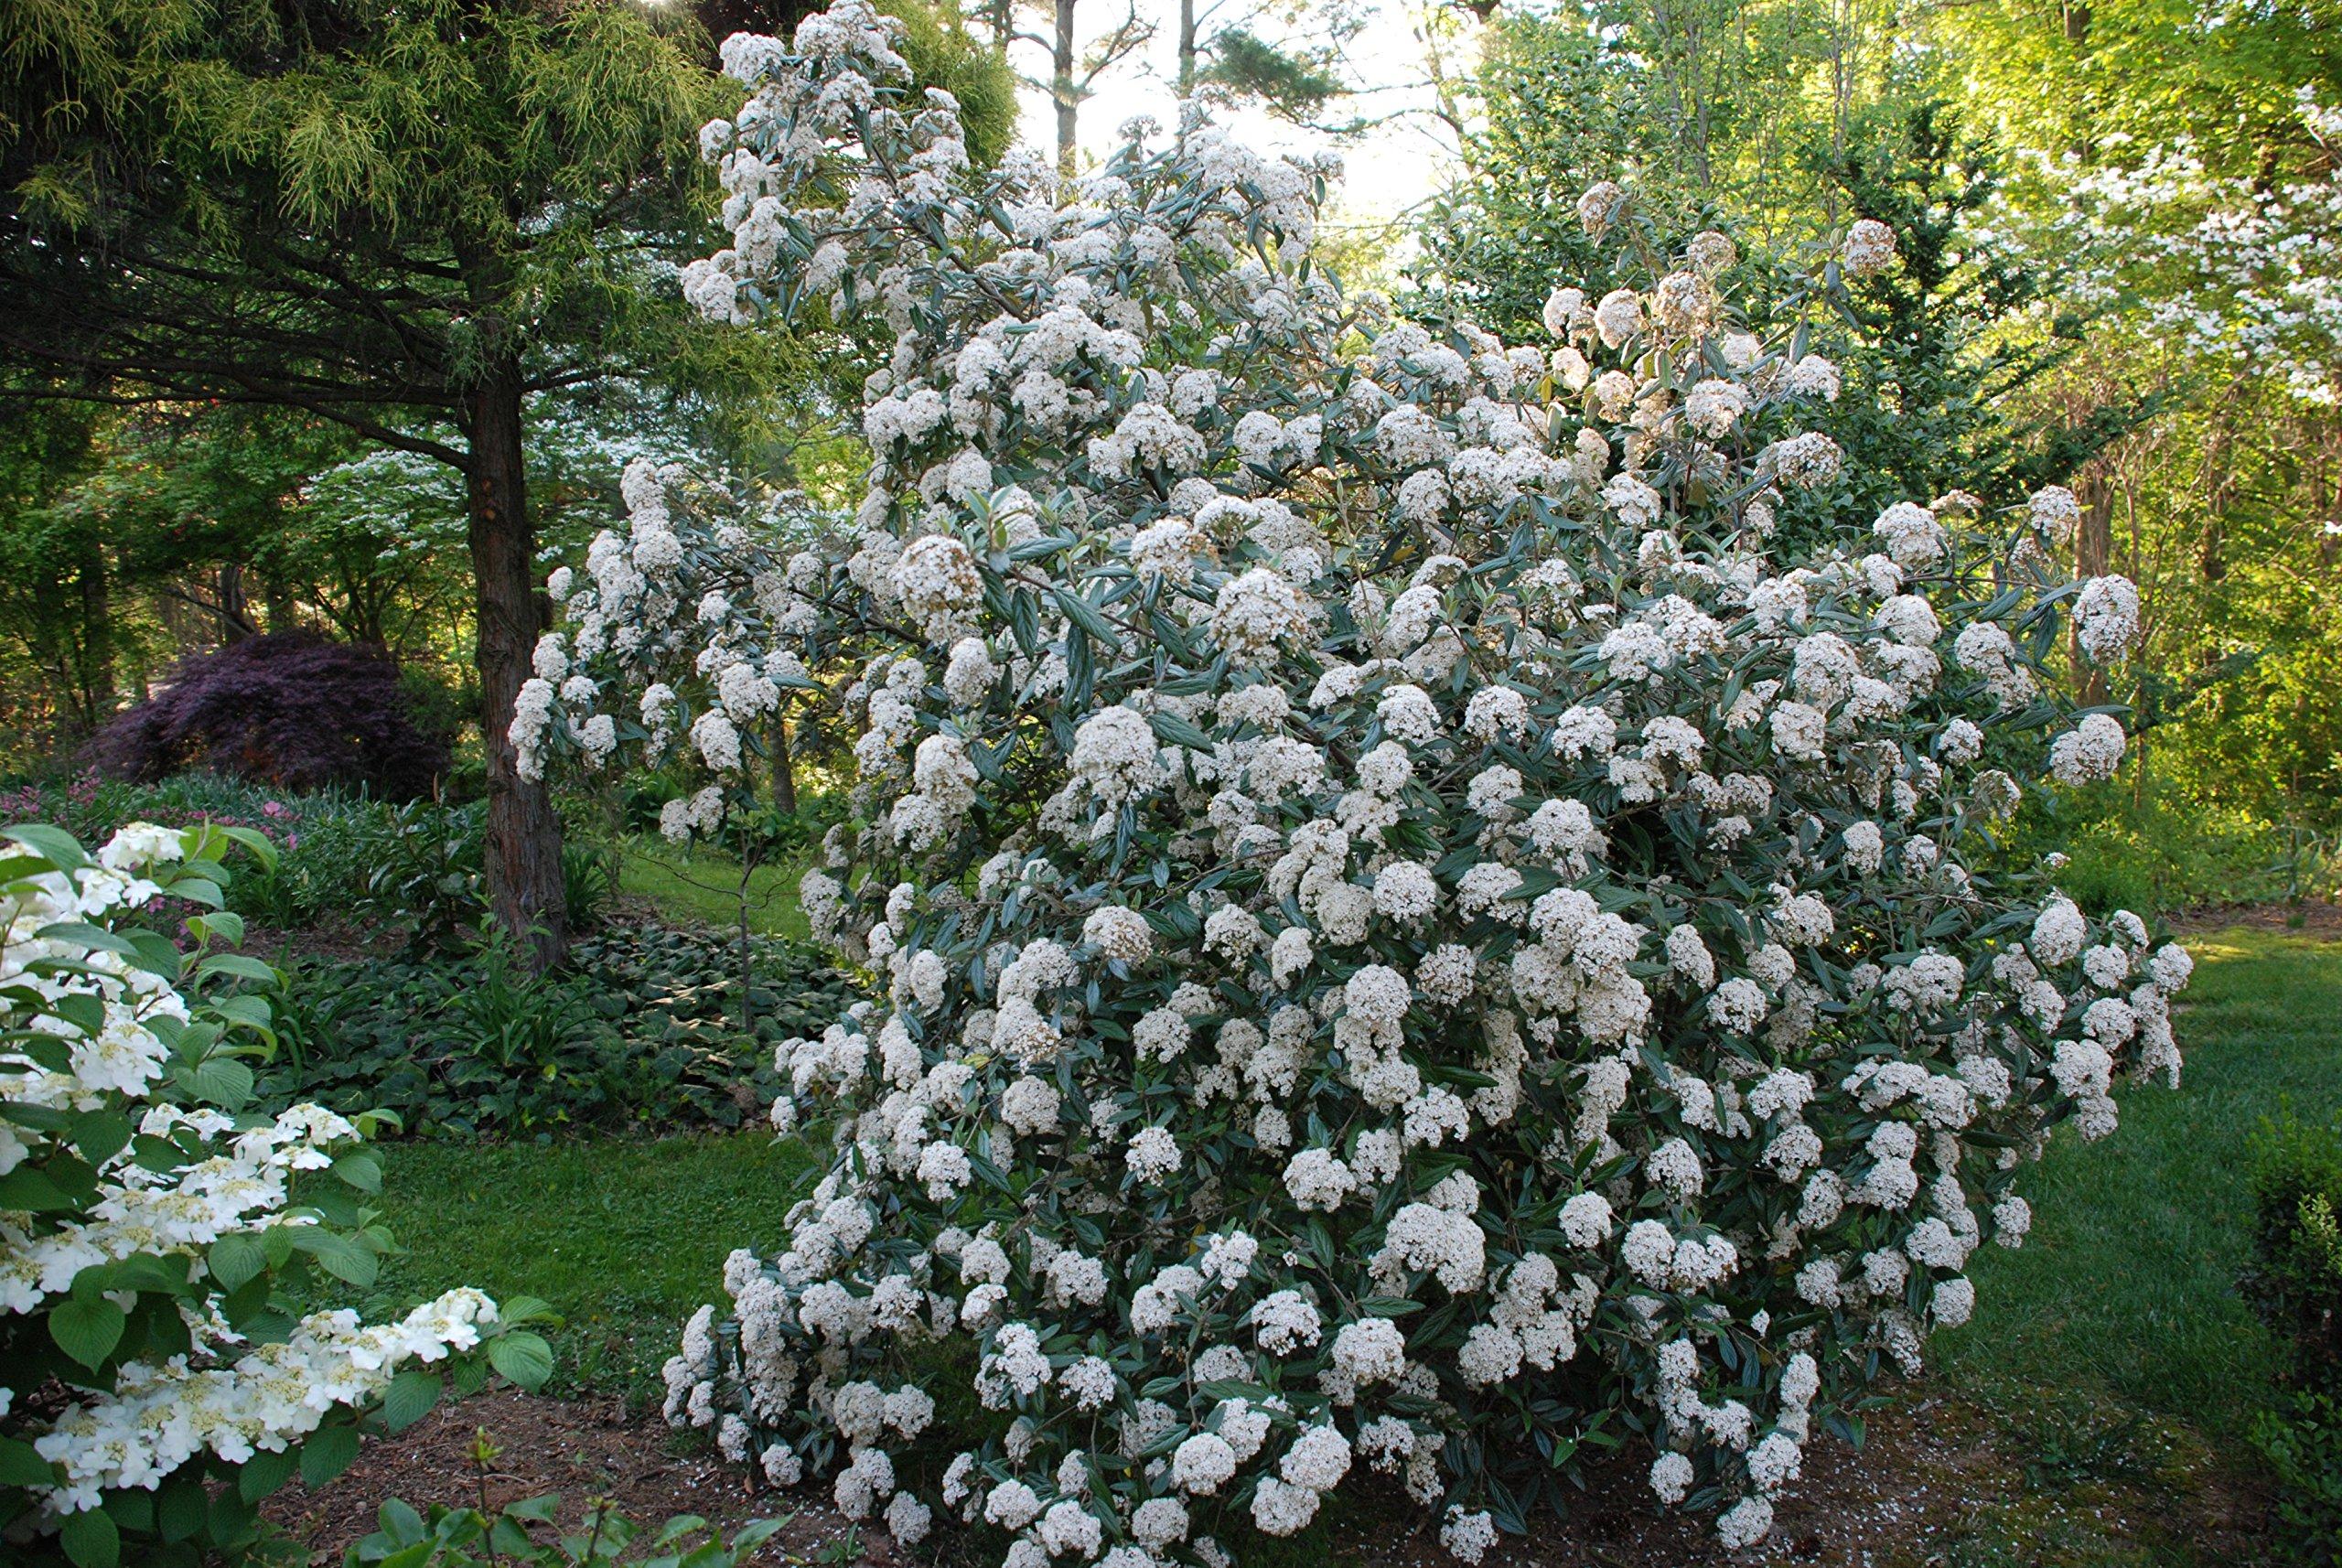 Pragense Viburnum - Live Plants - Lot of 10 Shrubs 2 Feet Tall - Prague Hedge by DAS Farms